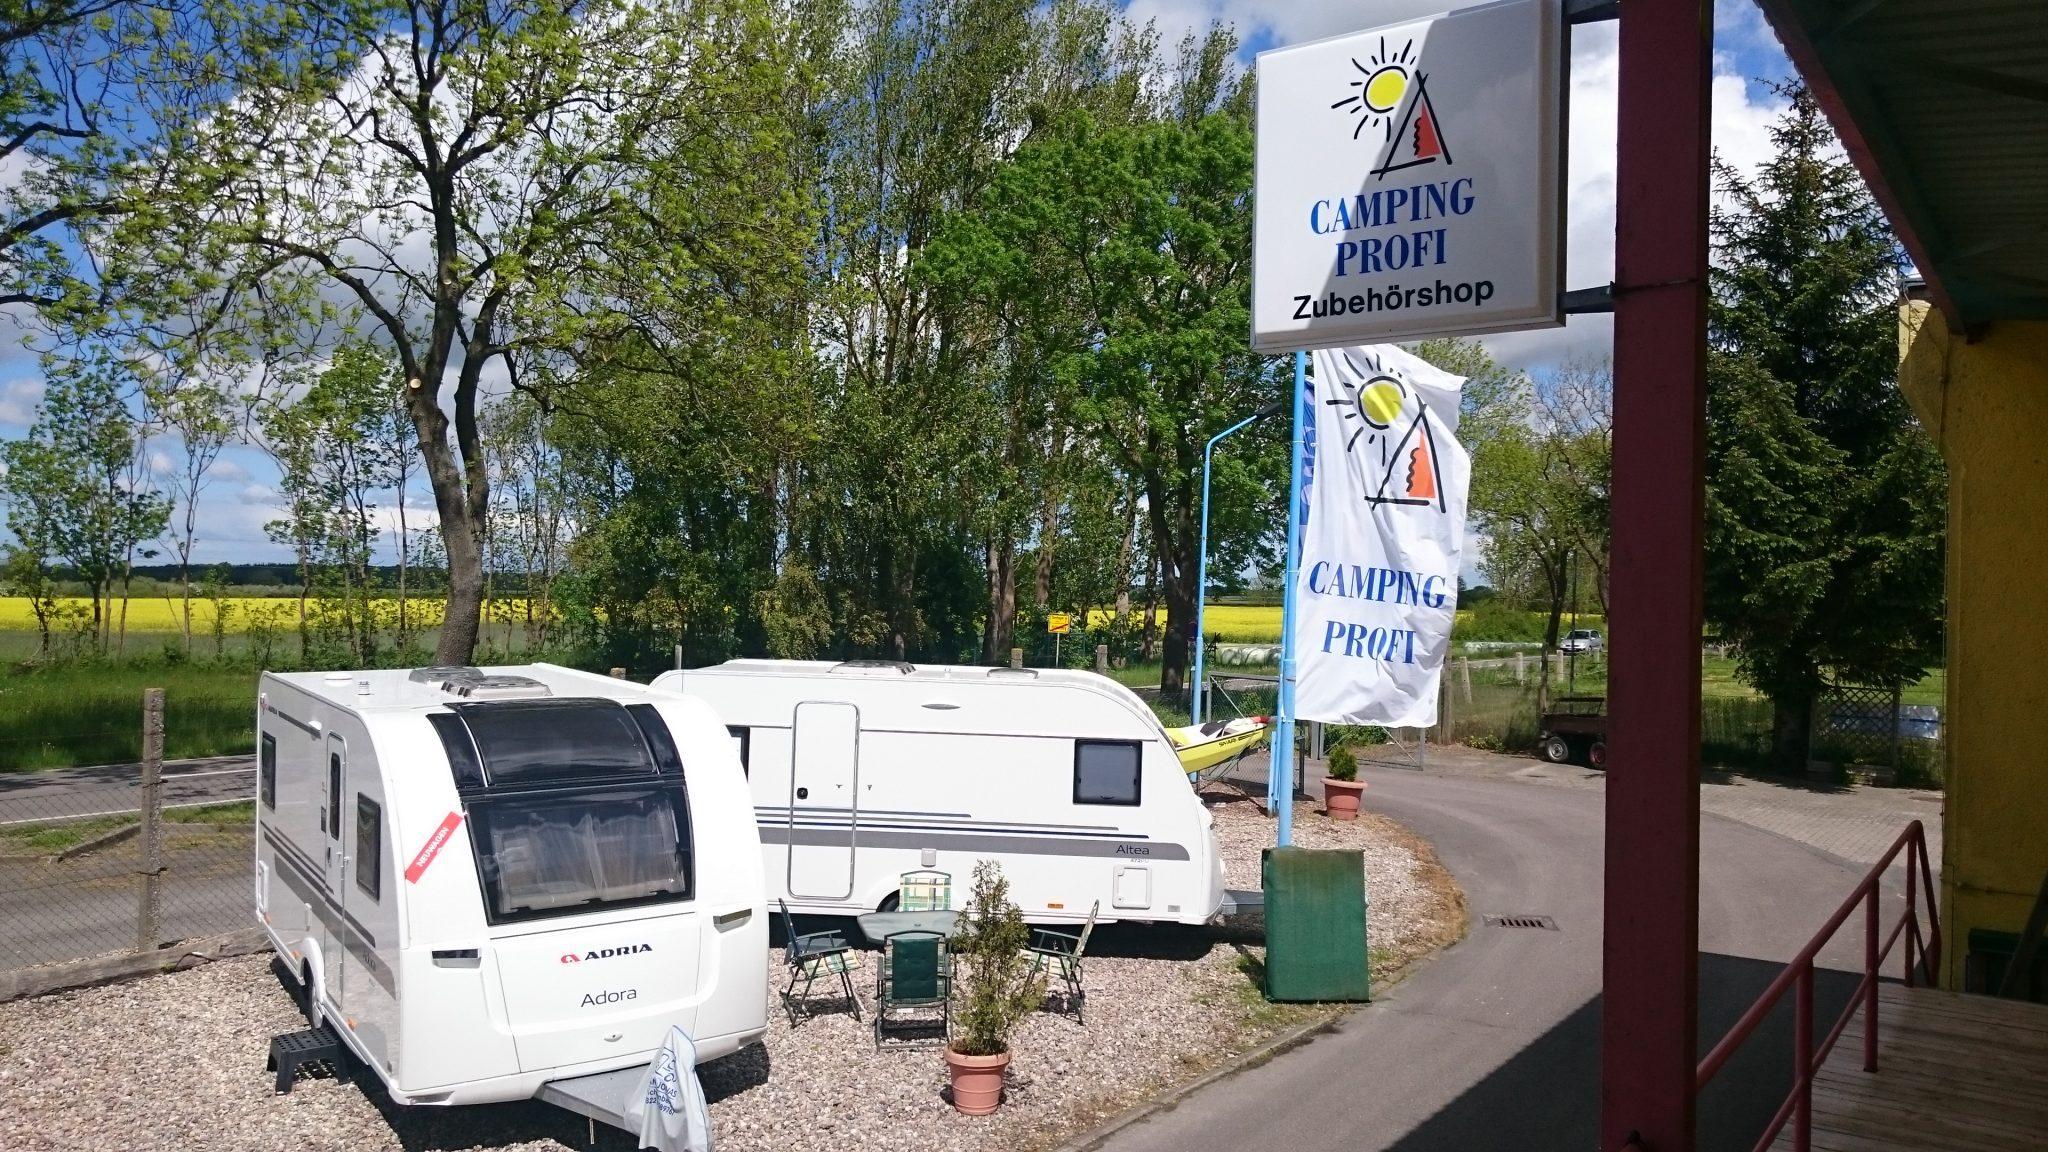 Caravancenter, Caravan Center